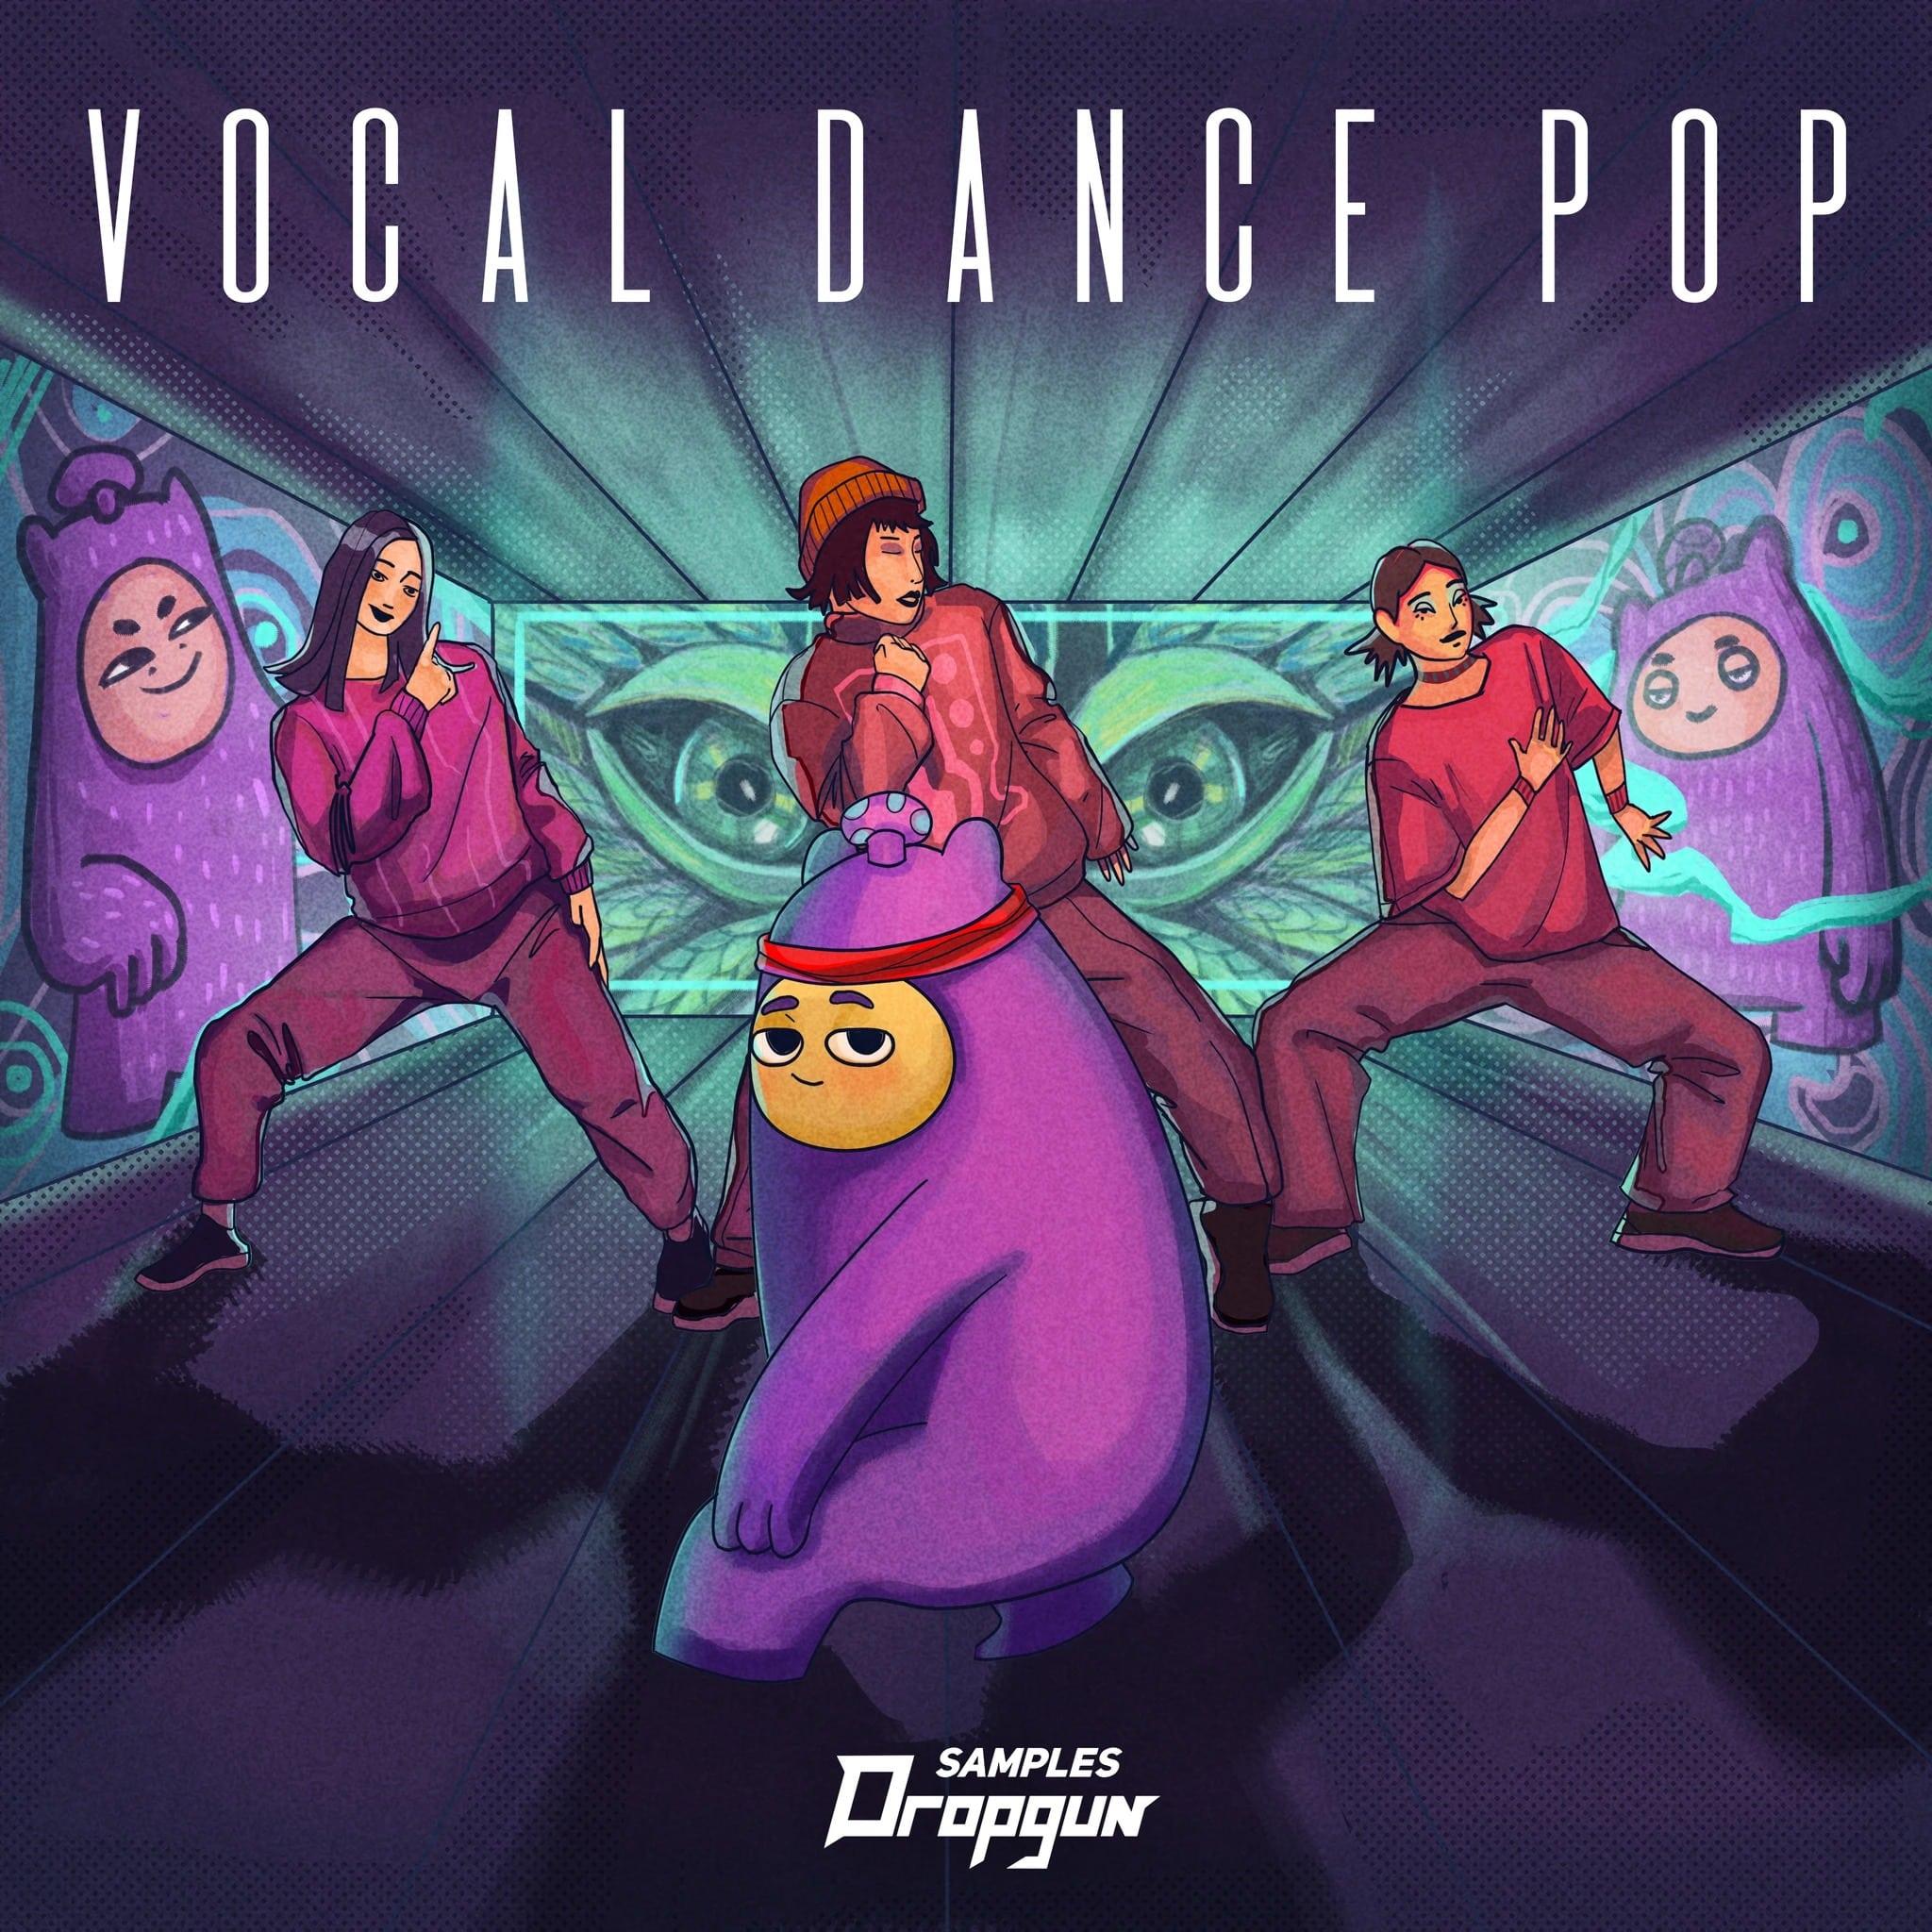 Dropgun Samples - Vocal Dance Pop